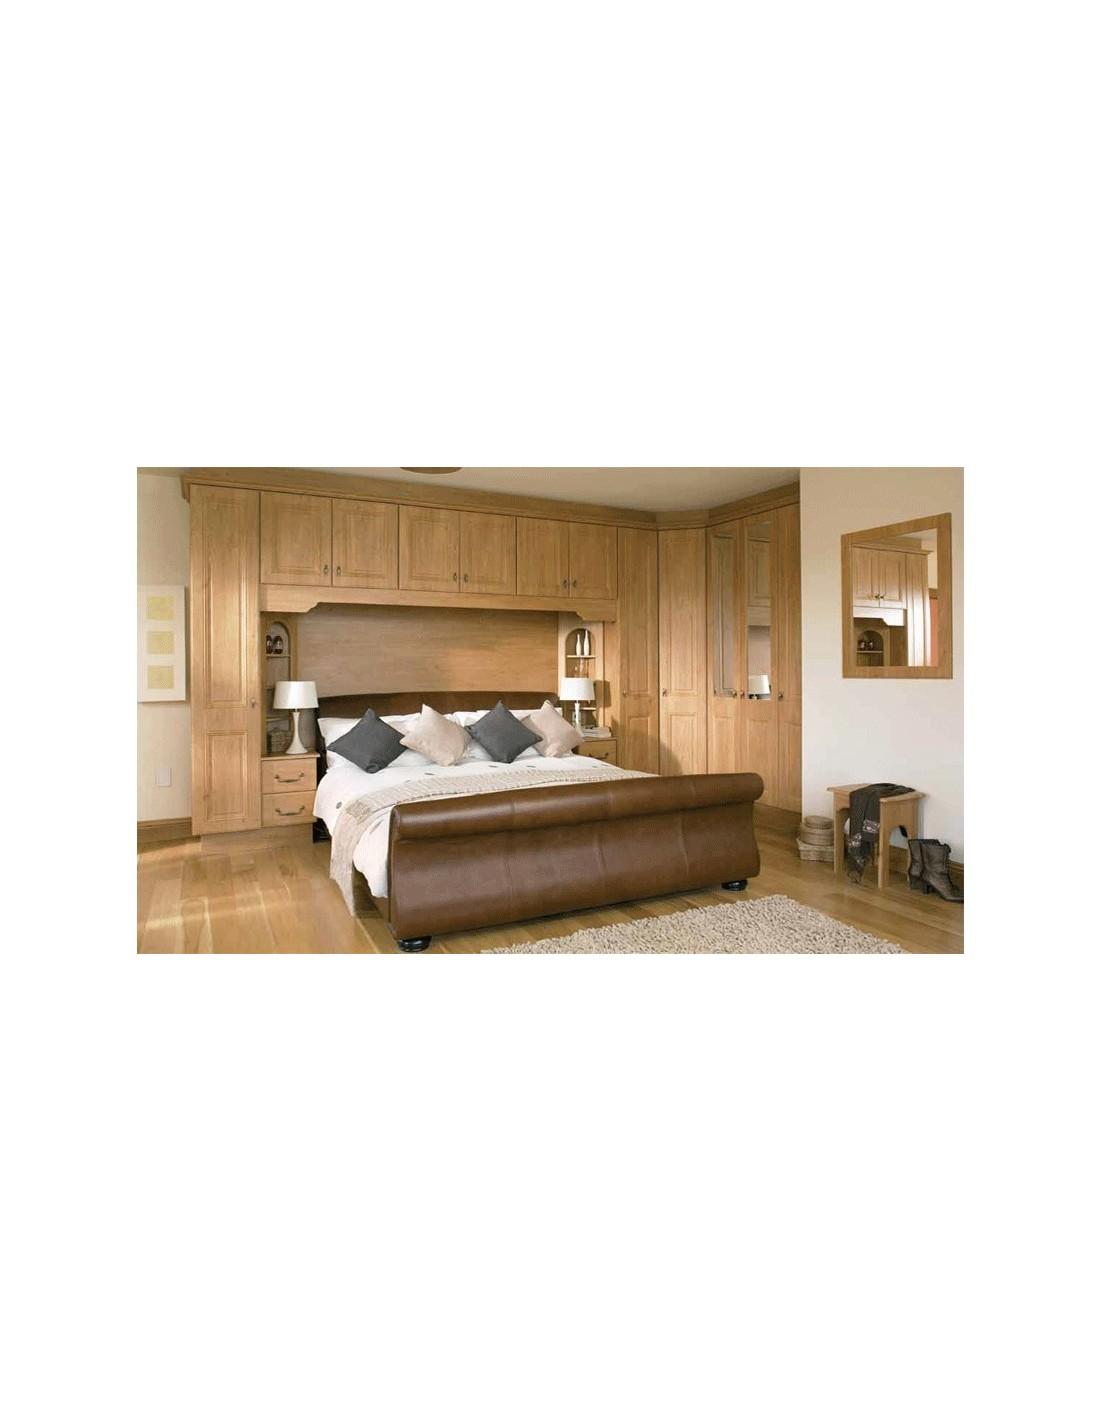 made to measure doors east coast kitchens. Black Bedroom Furniture Sets. Home Design Ideas